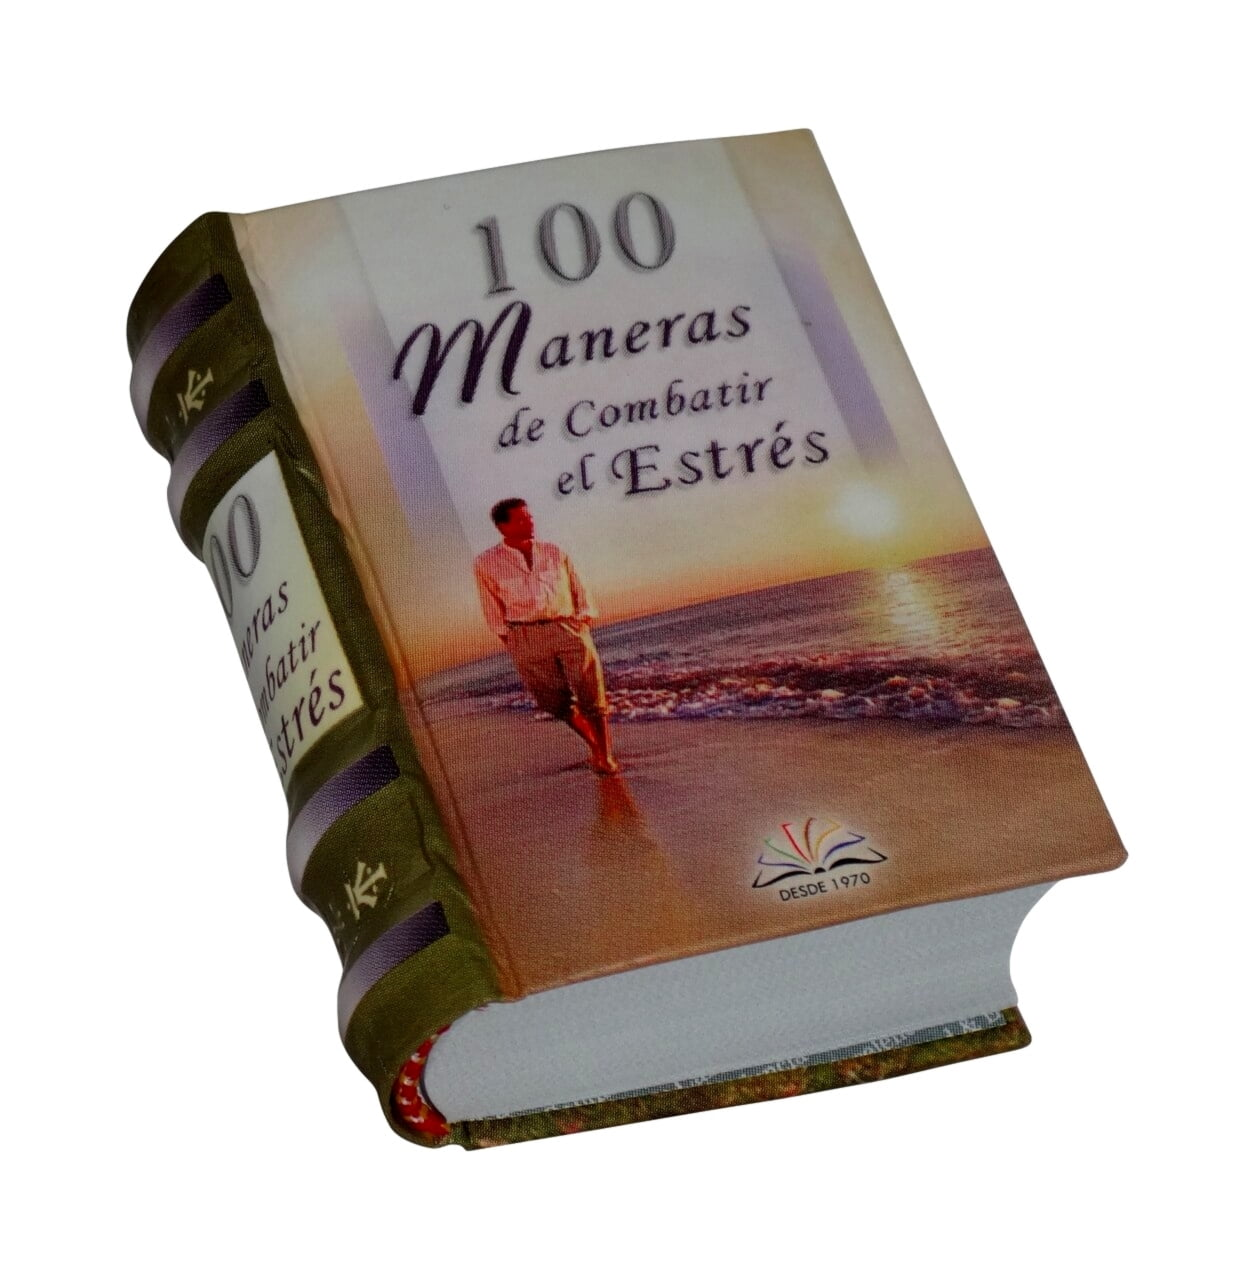 100_maneras-combatir-stress-miniature-book-libro